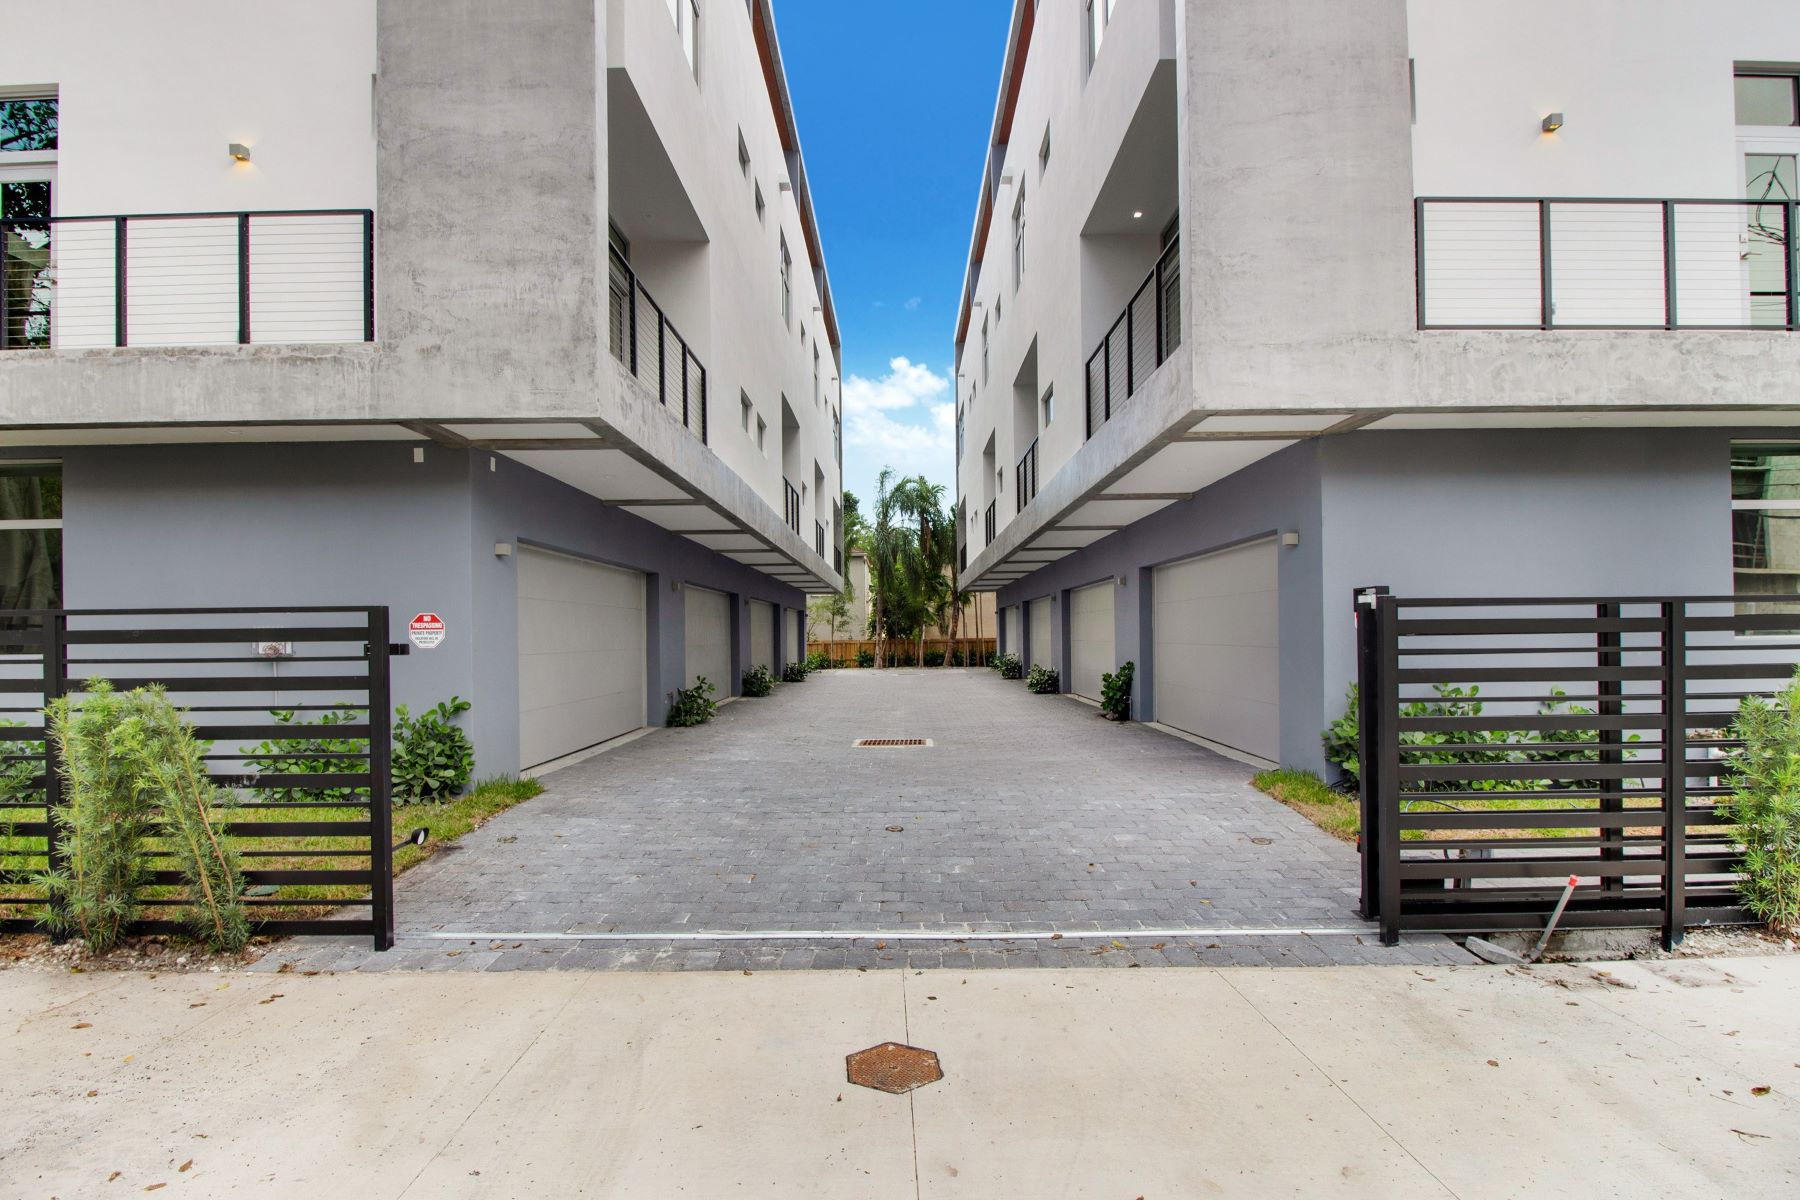 townhouses 为 销售 在 2924 Bird Avenue 1 椰树林, 佛罗里达州 33133 美国